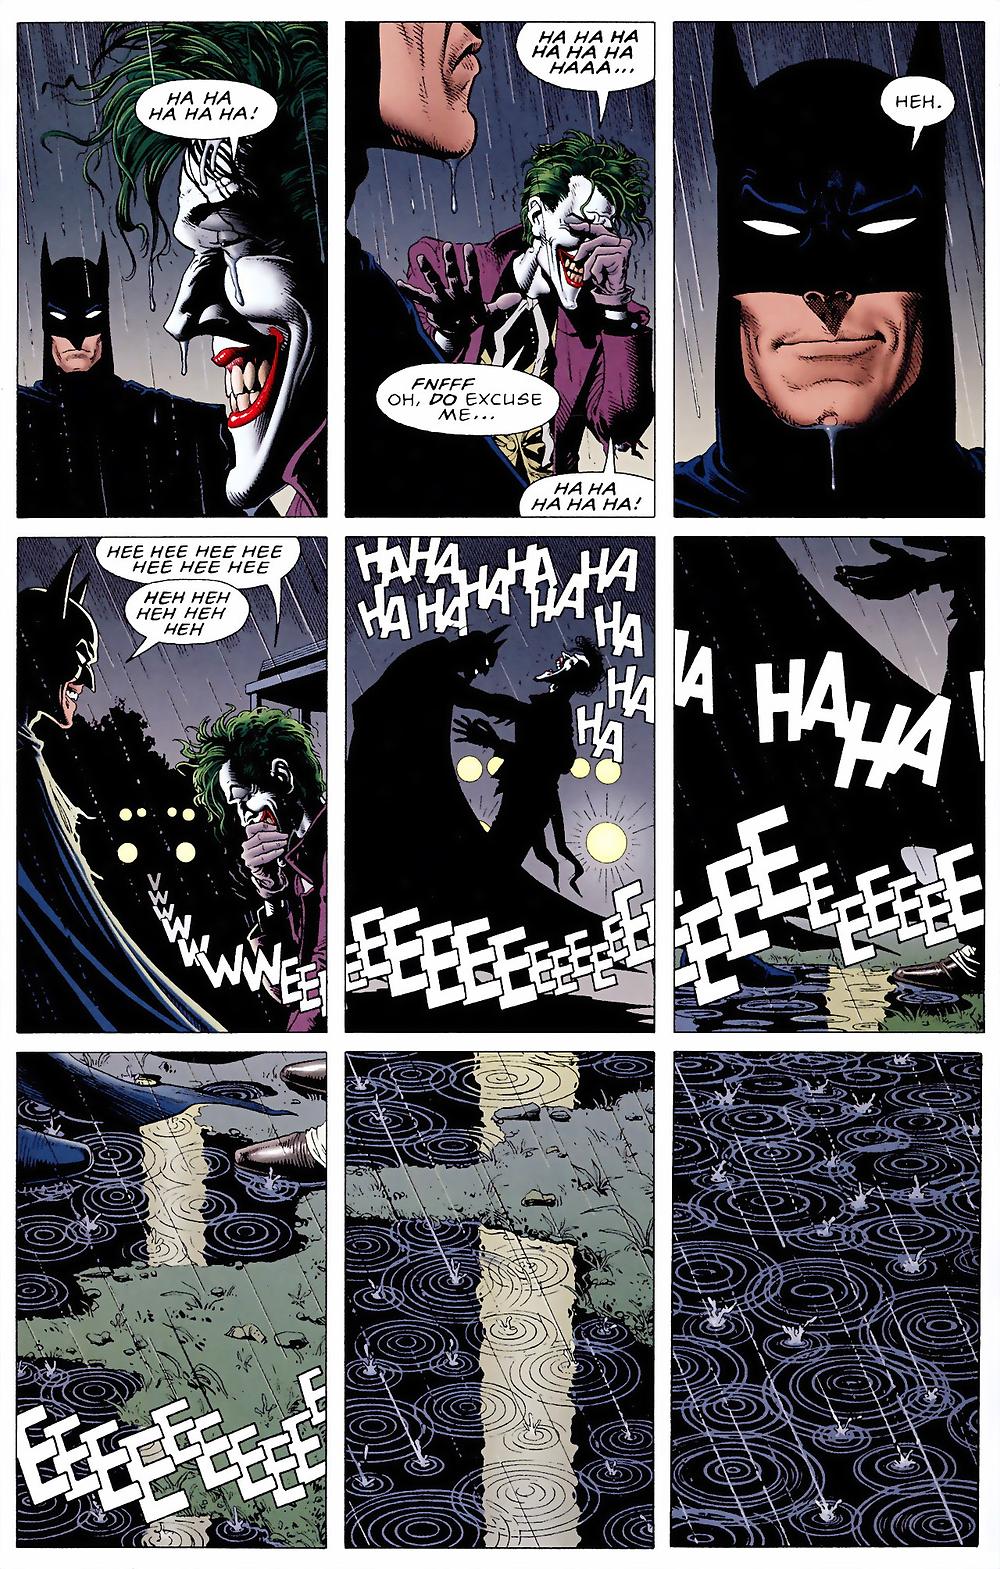 piada-mortal-ultima-pagina